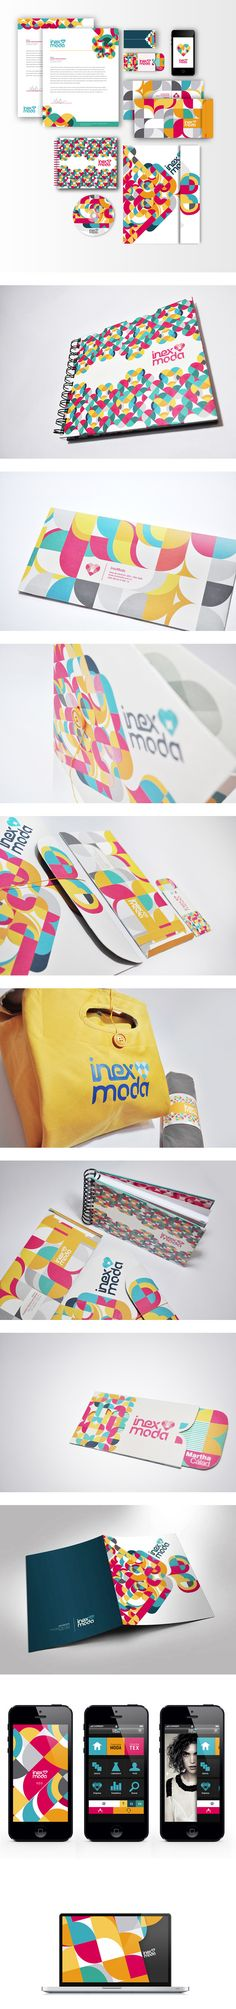 Cool Brand Identity Design. InexModa. #branding #brandidentity [http://www.pinterest.com/alfredchong/]